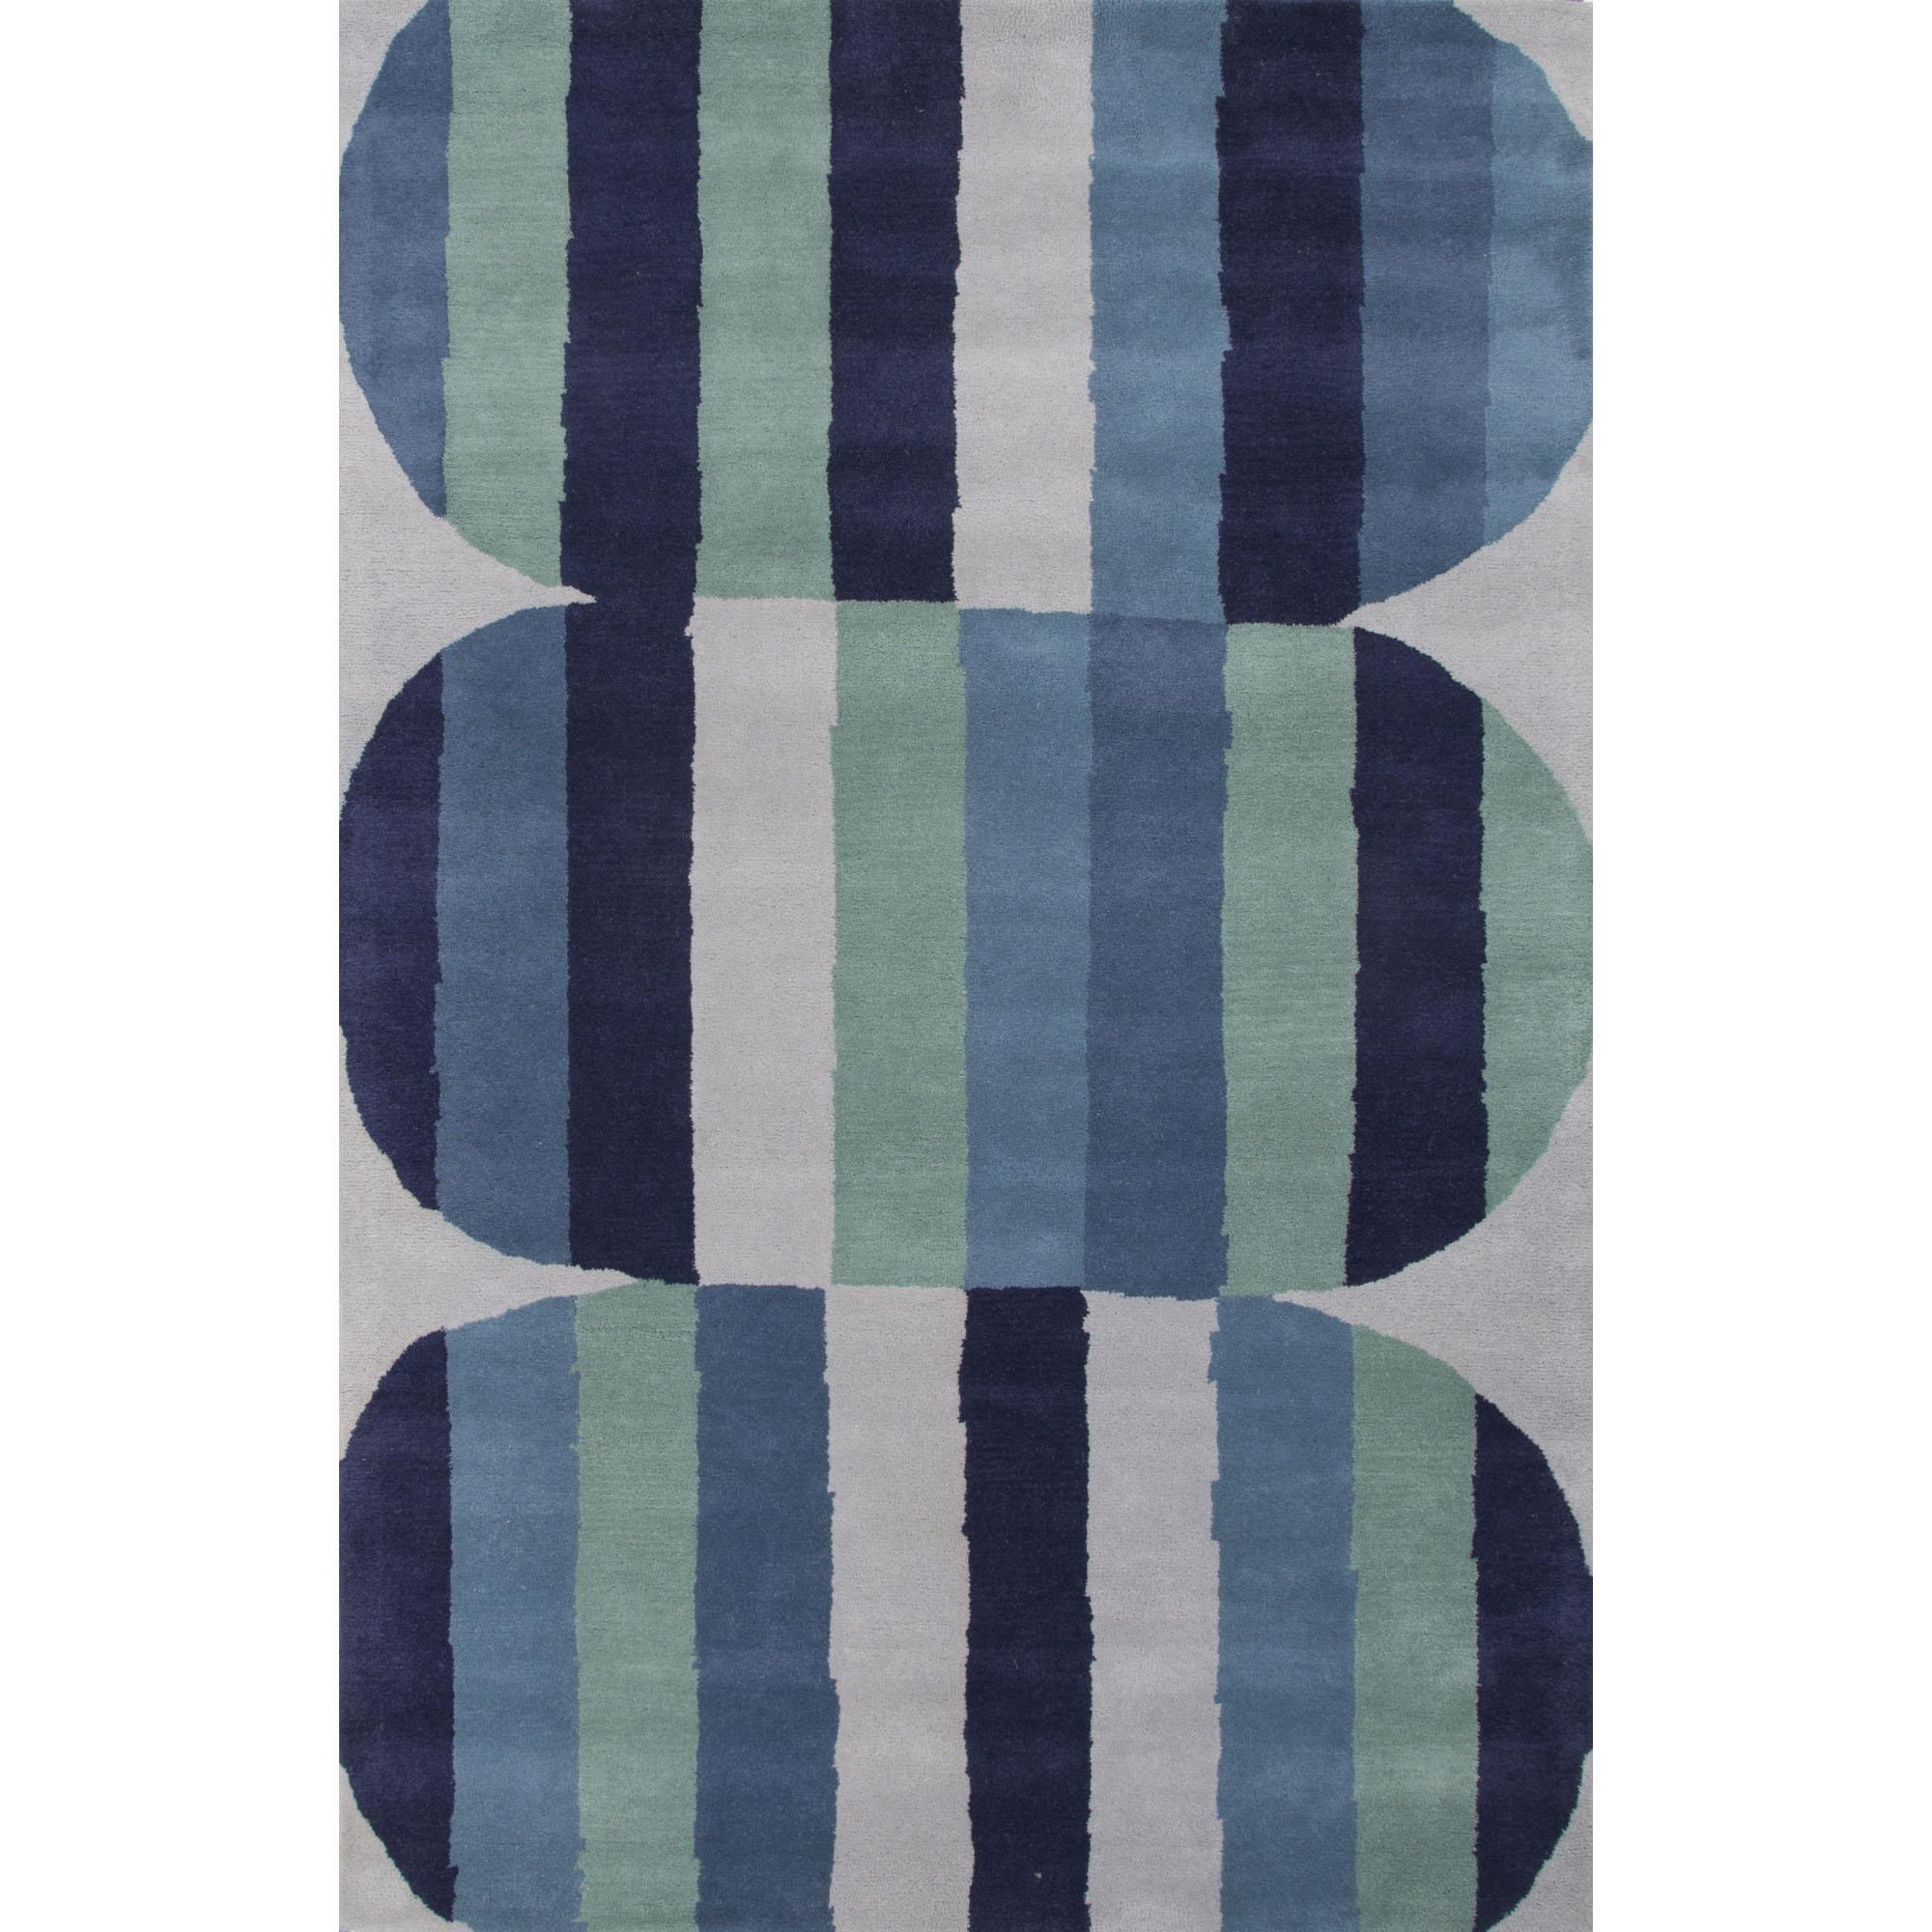 JAIPUR Rugs En Casa By Luli Sanchez Tufted 5 x 8 Rug - Item Number: RUG115642